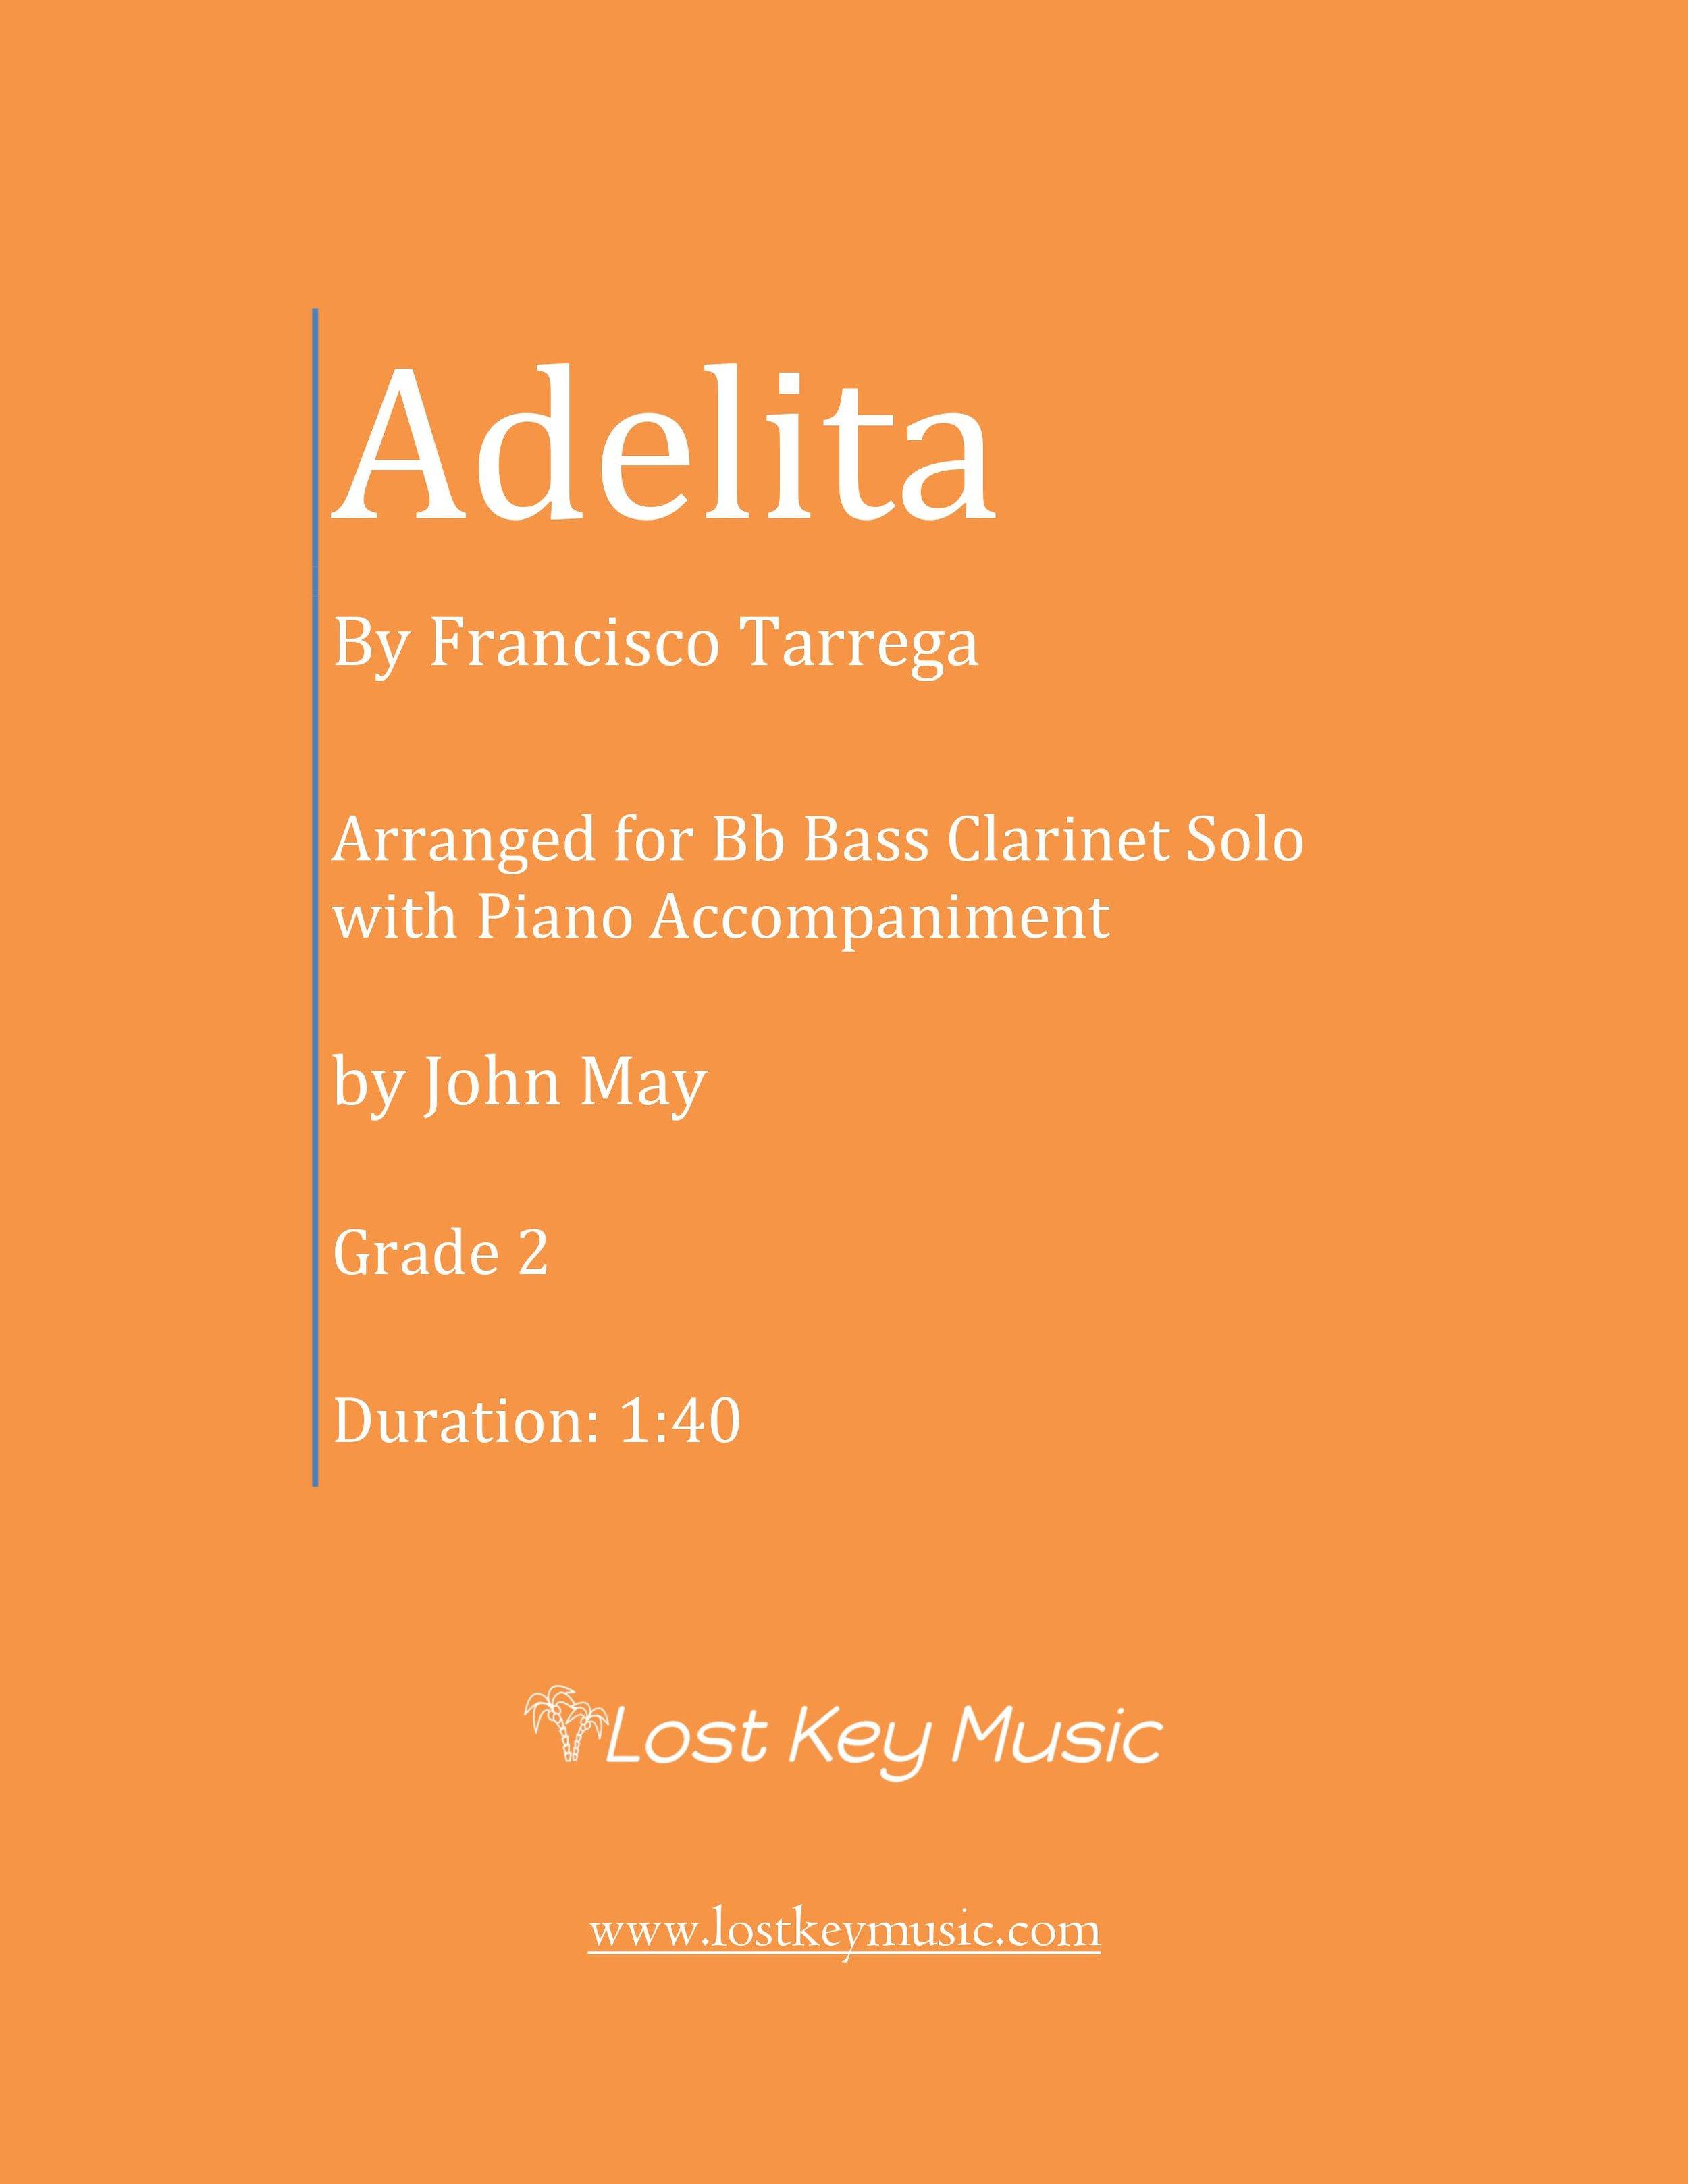 Adelita-Bb Bass Clarinet Solo-Cover Photo.jpg